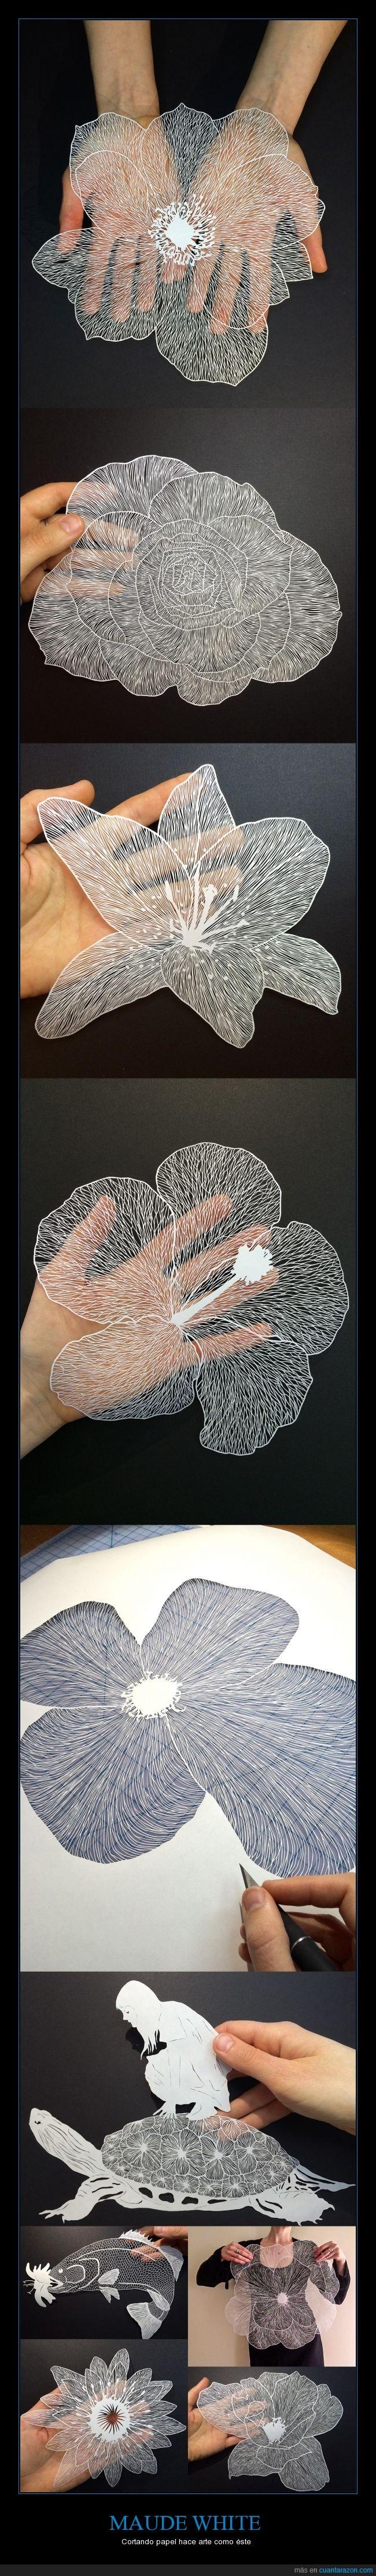 arte,cortar,cutter,delicado,flor,hoja,Maude White,papel,tortuga